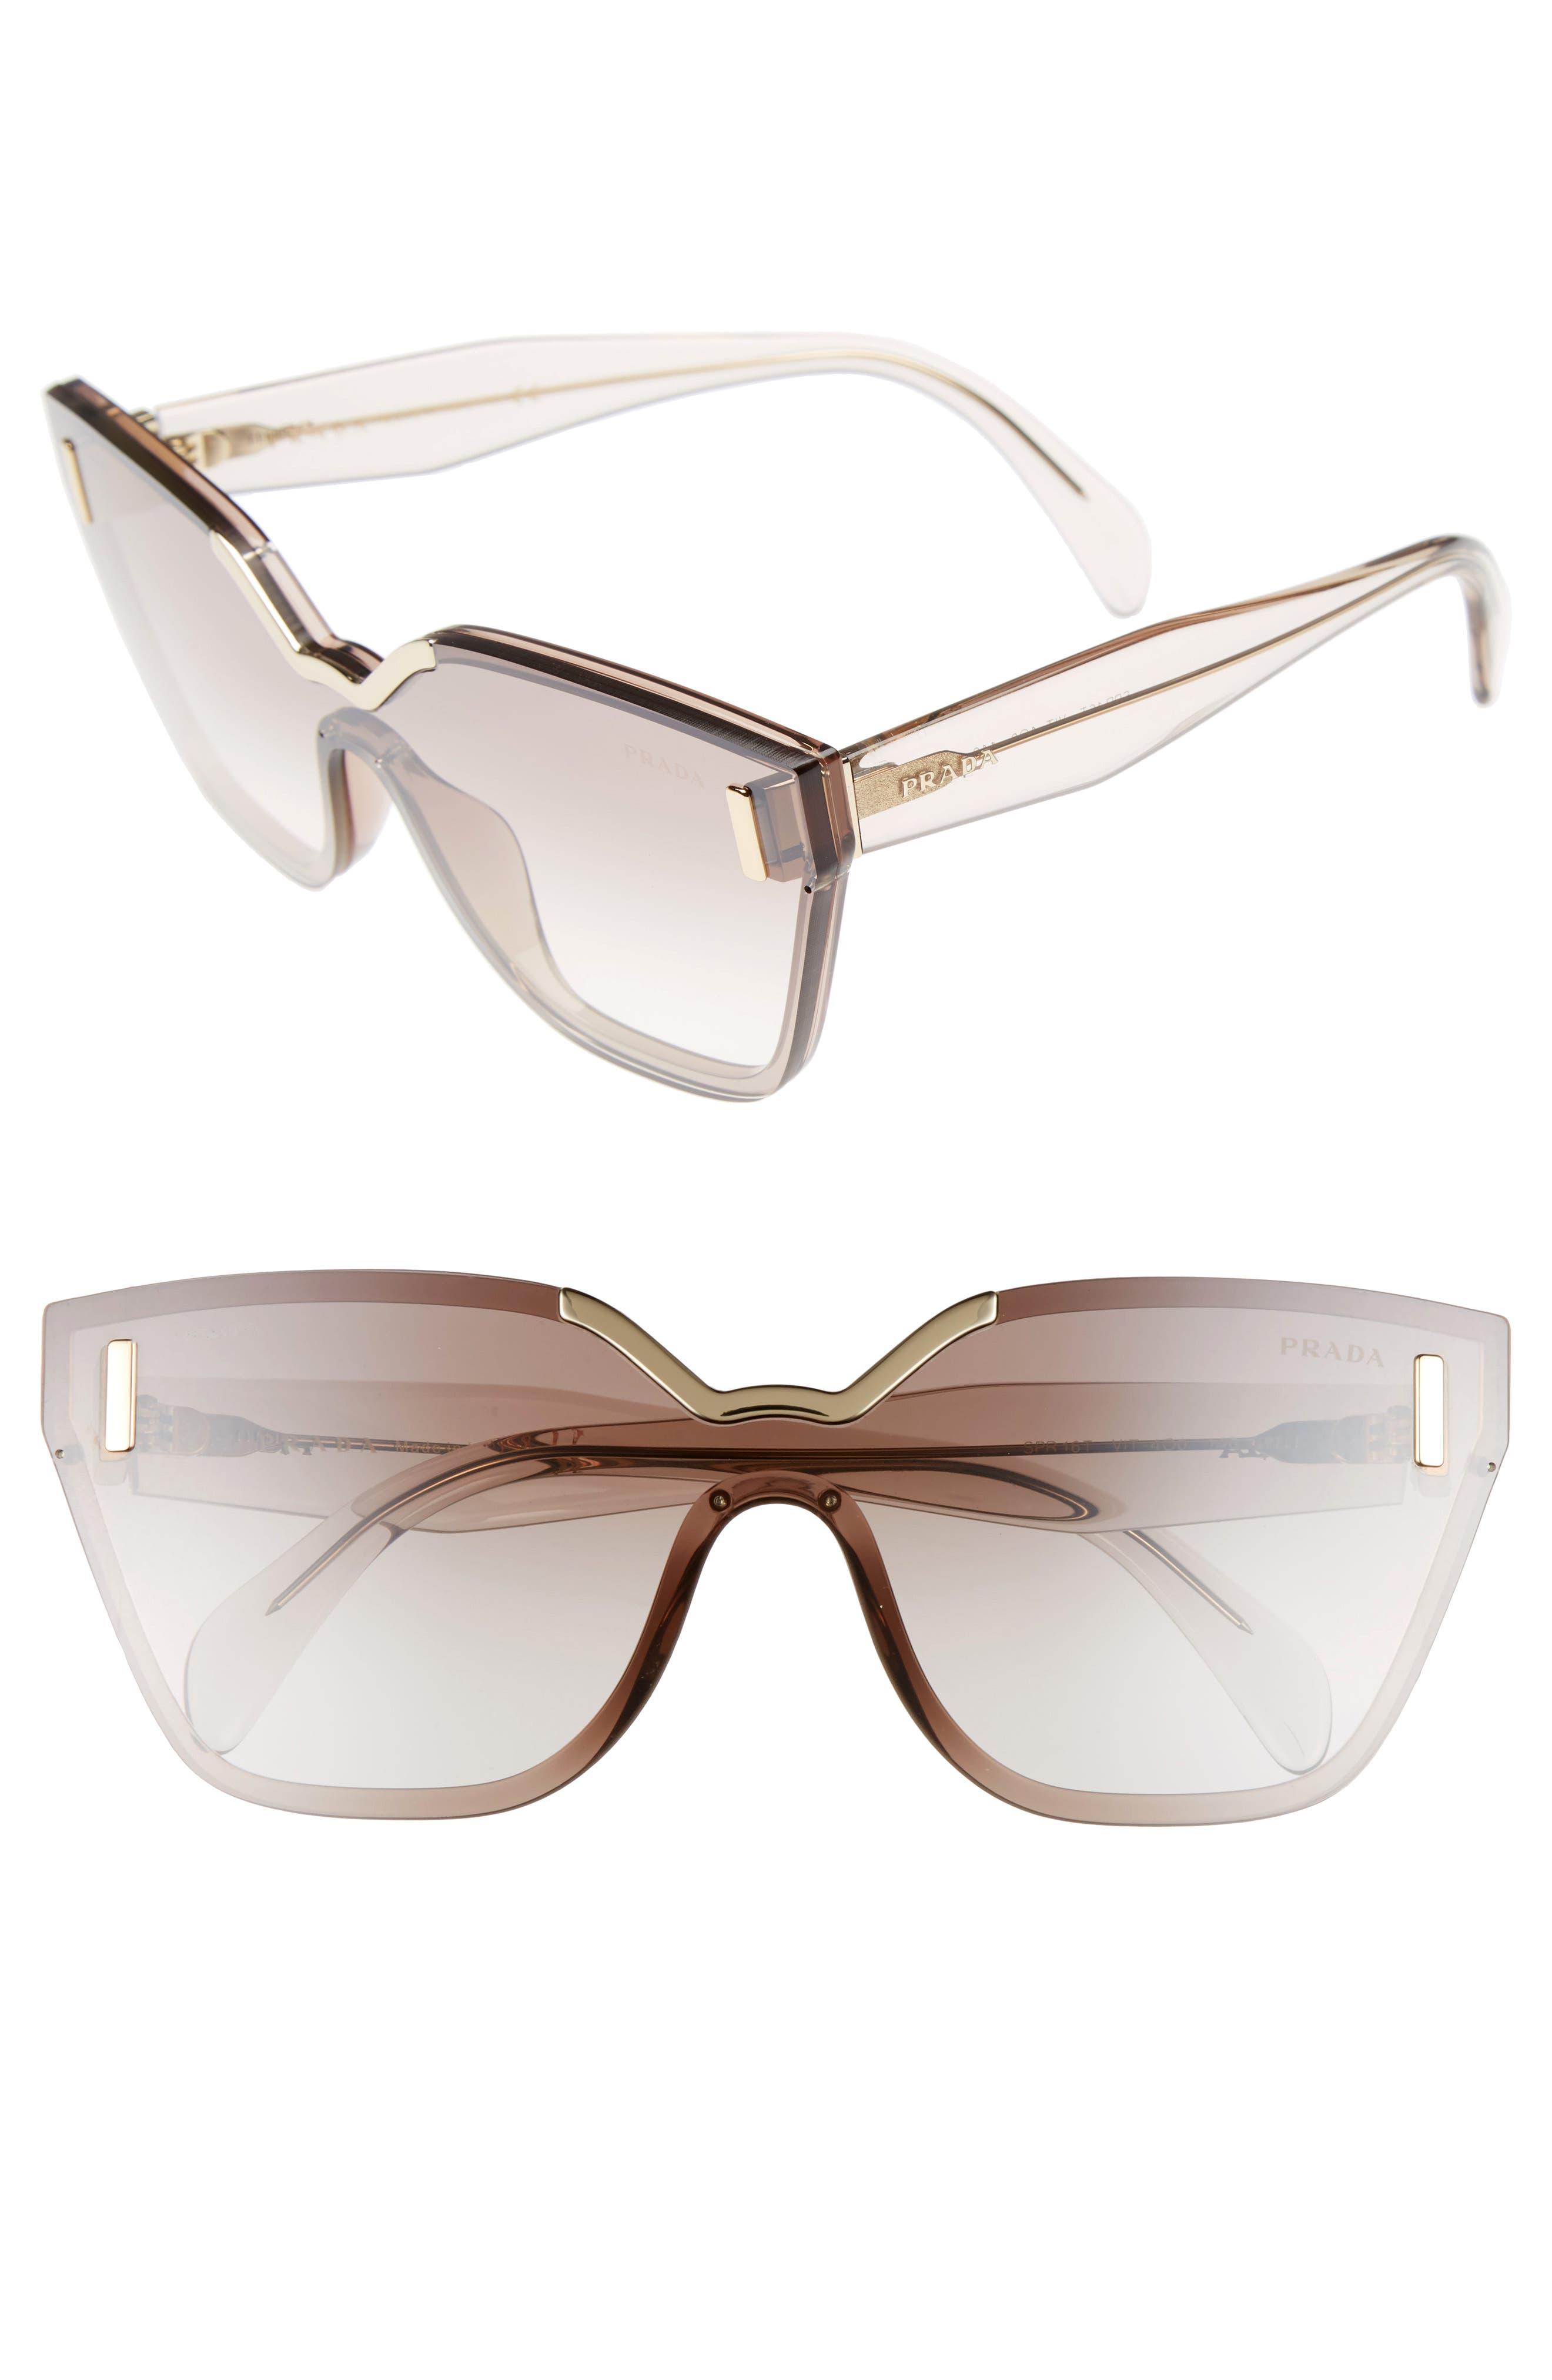 61mm Mirrored Shield Sunglasses,                             Main thumbnail 1, color,                             200